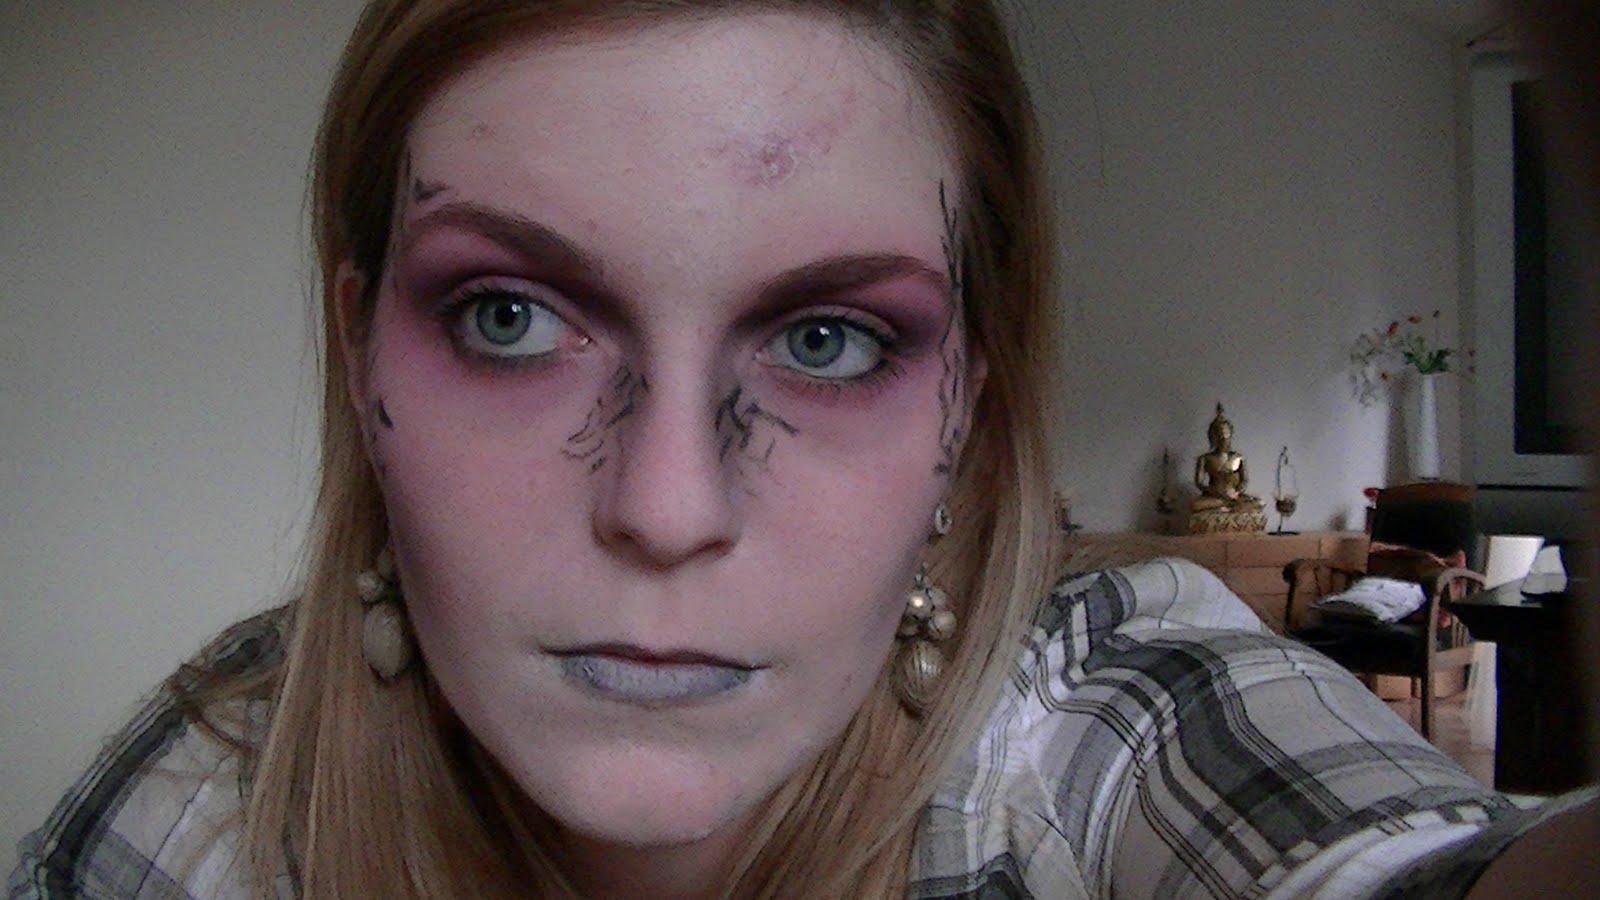 beaut rat e vid o maquillage d 39 halloween zombie chic. Black Bedroom Furniture Sets. Home Design Ideas